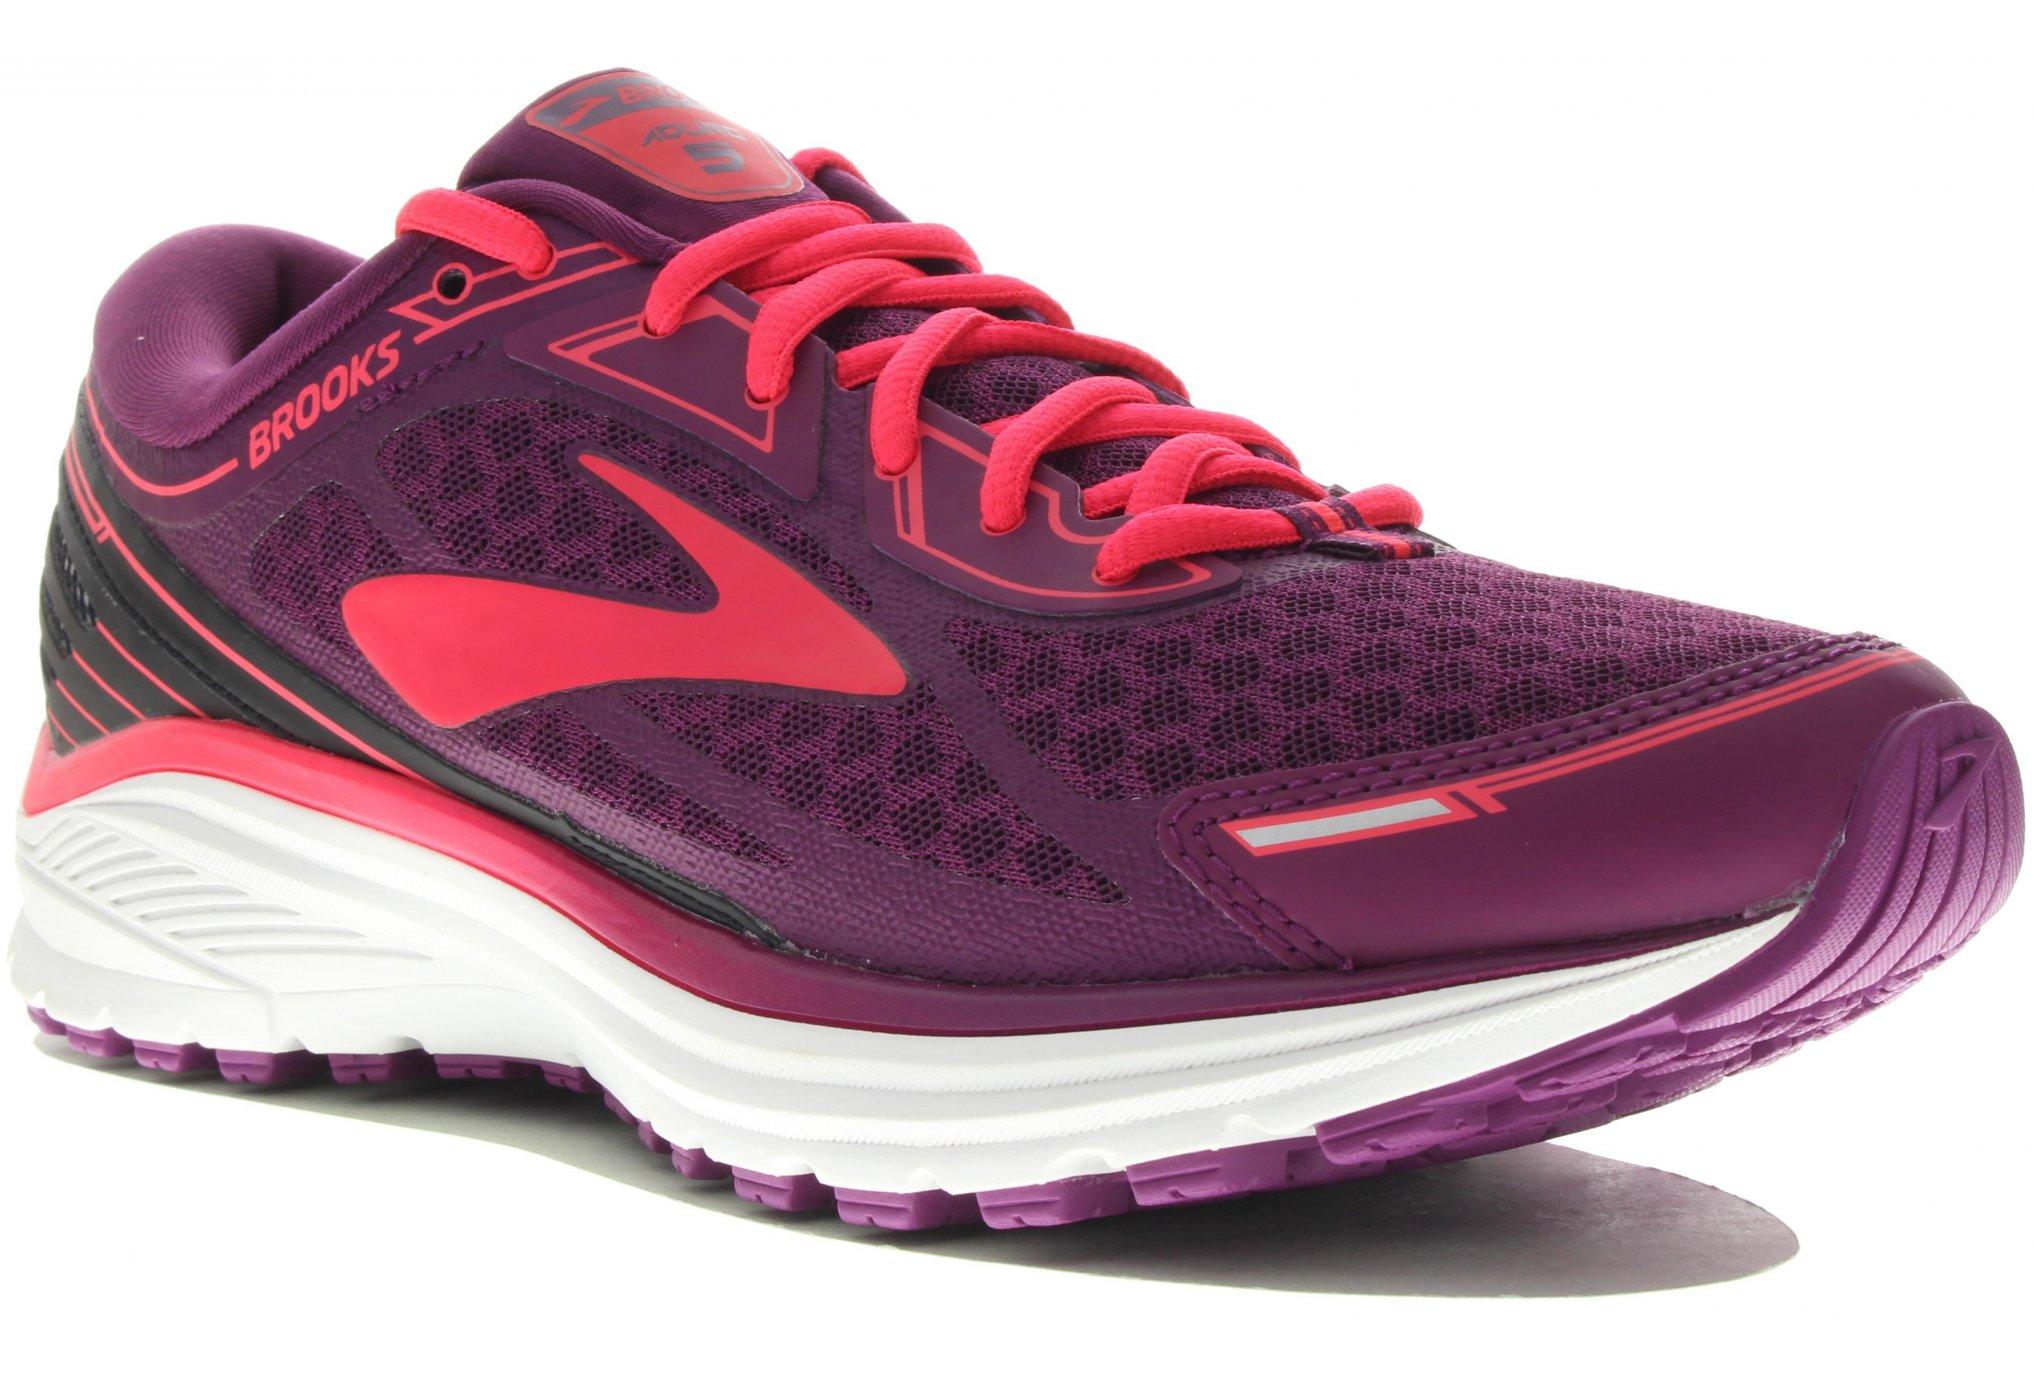 Brooks Aduro 5 w chaussures running femme